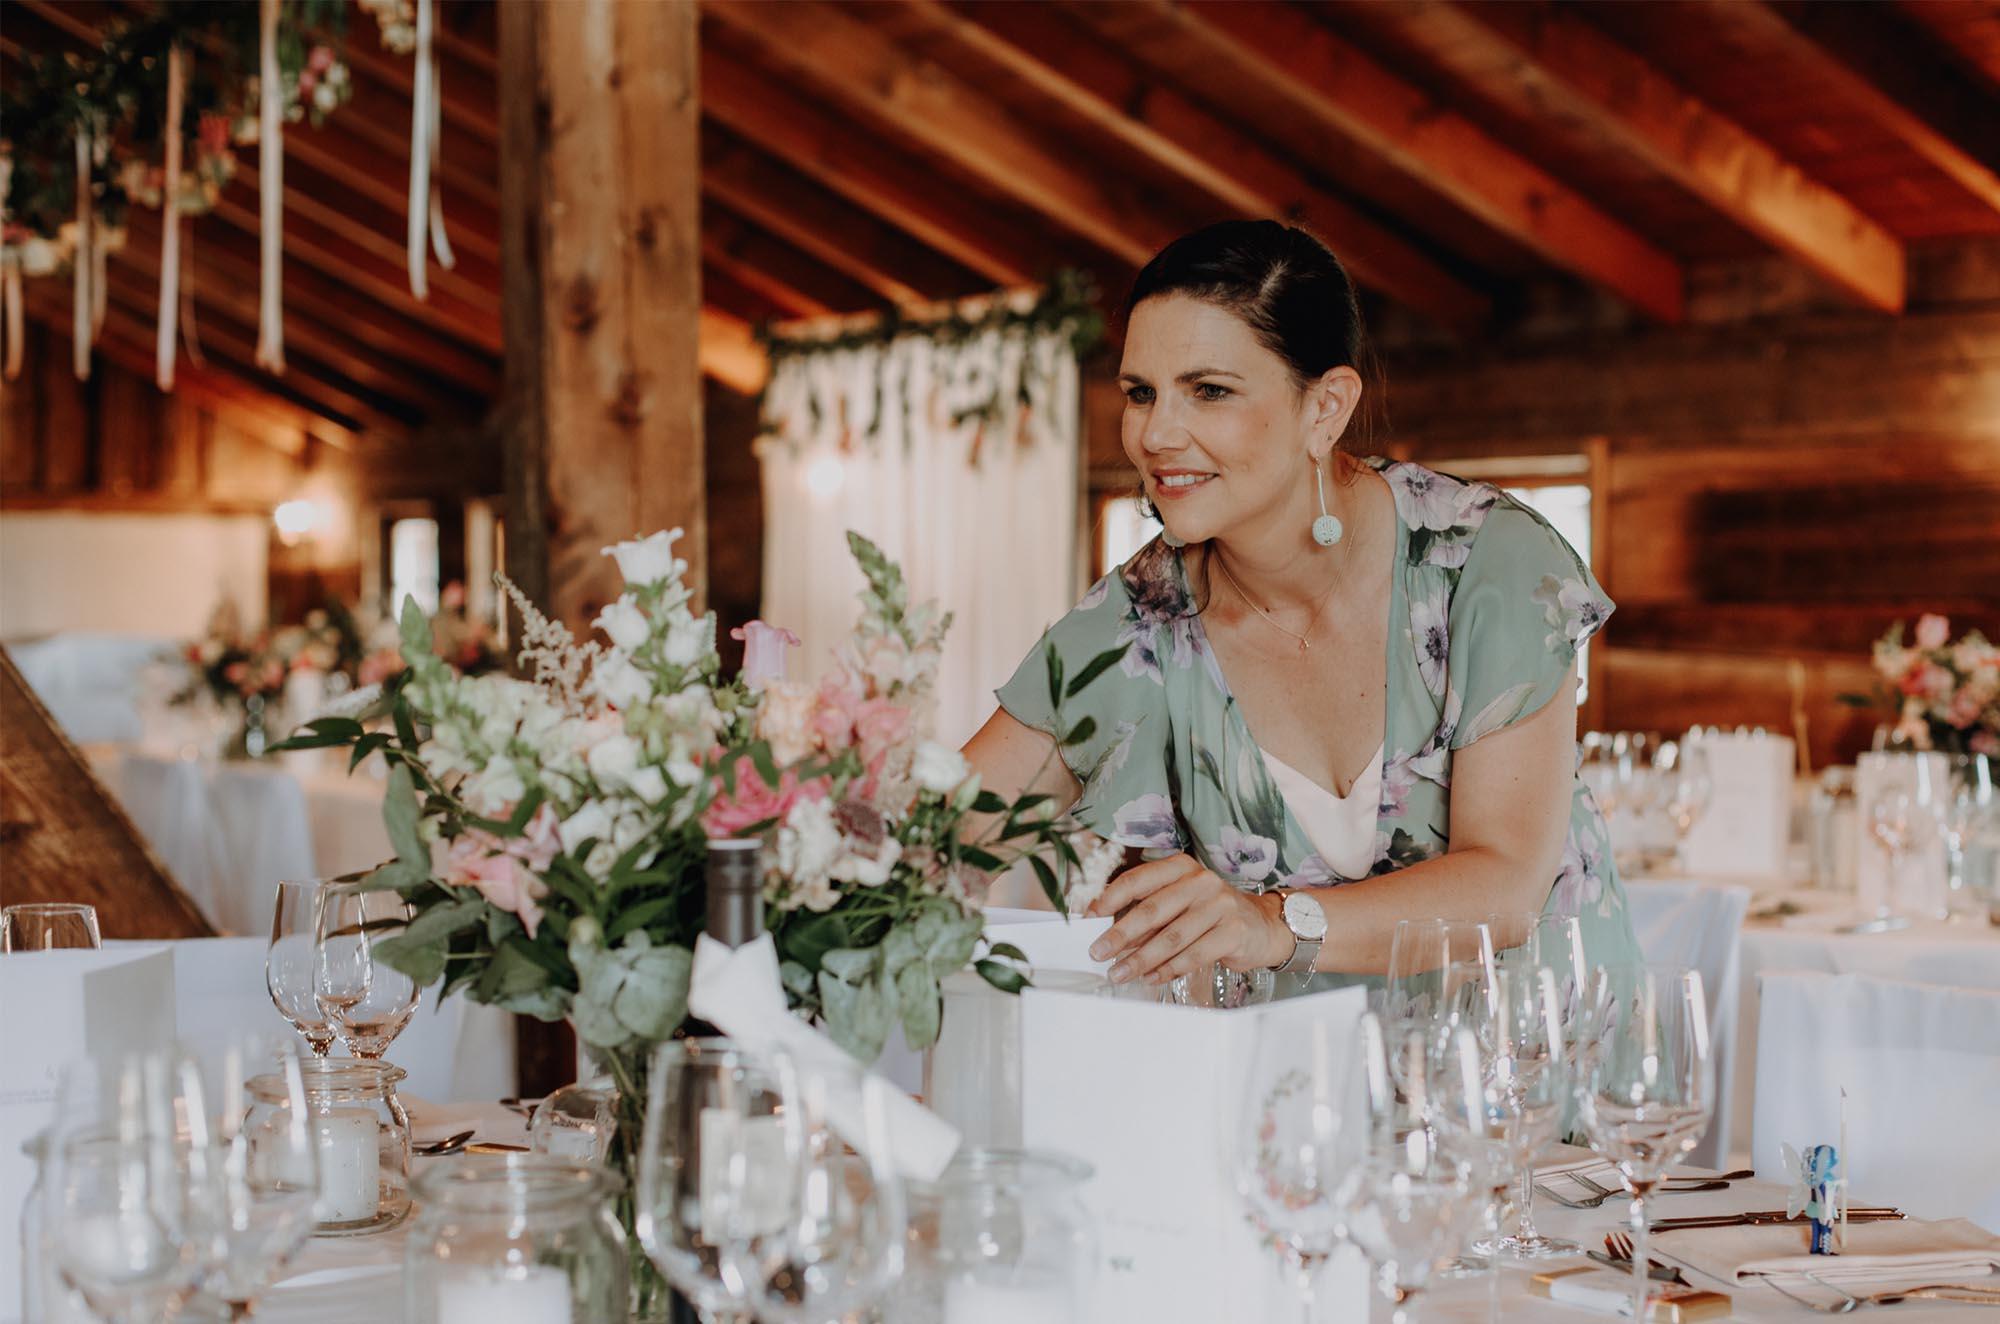 Jasagerei – Hochzeitsplanerin Sylvia Rill